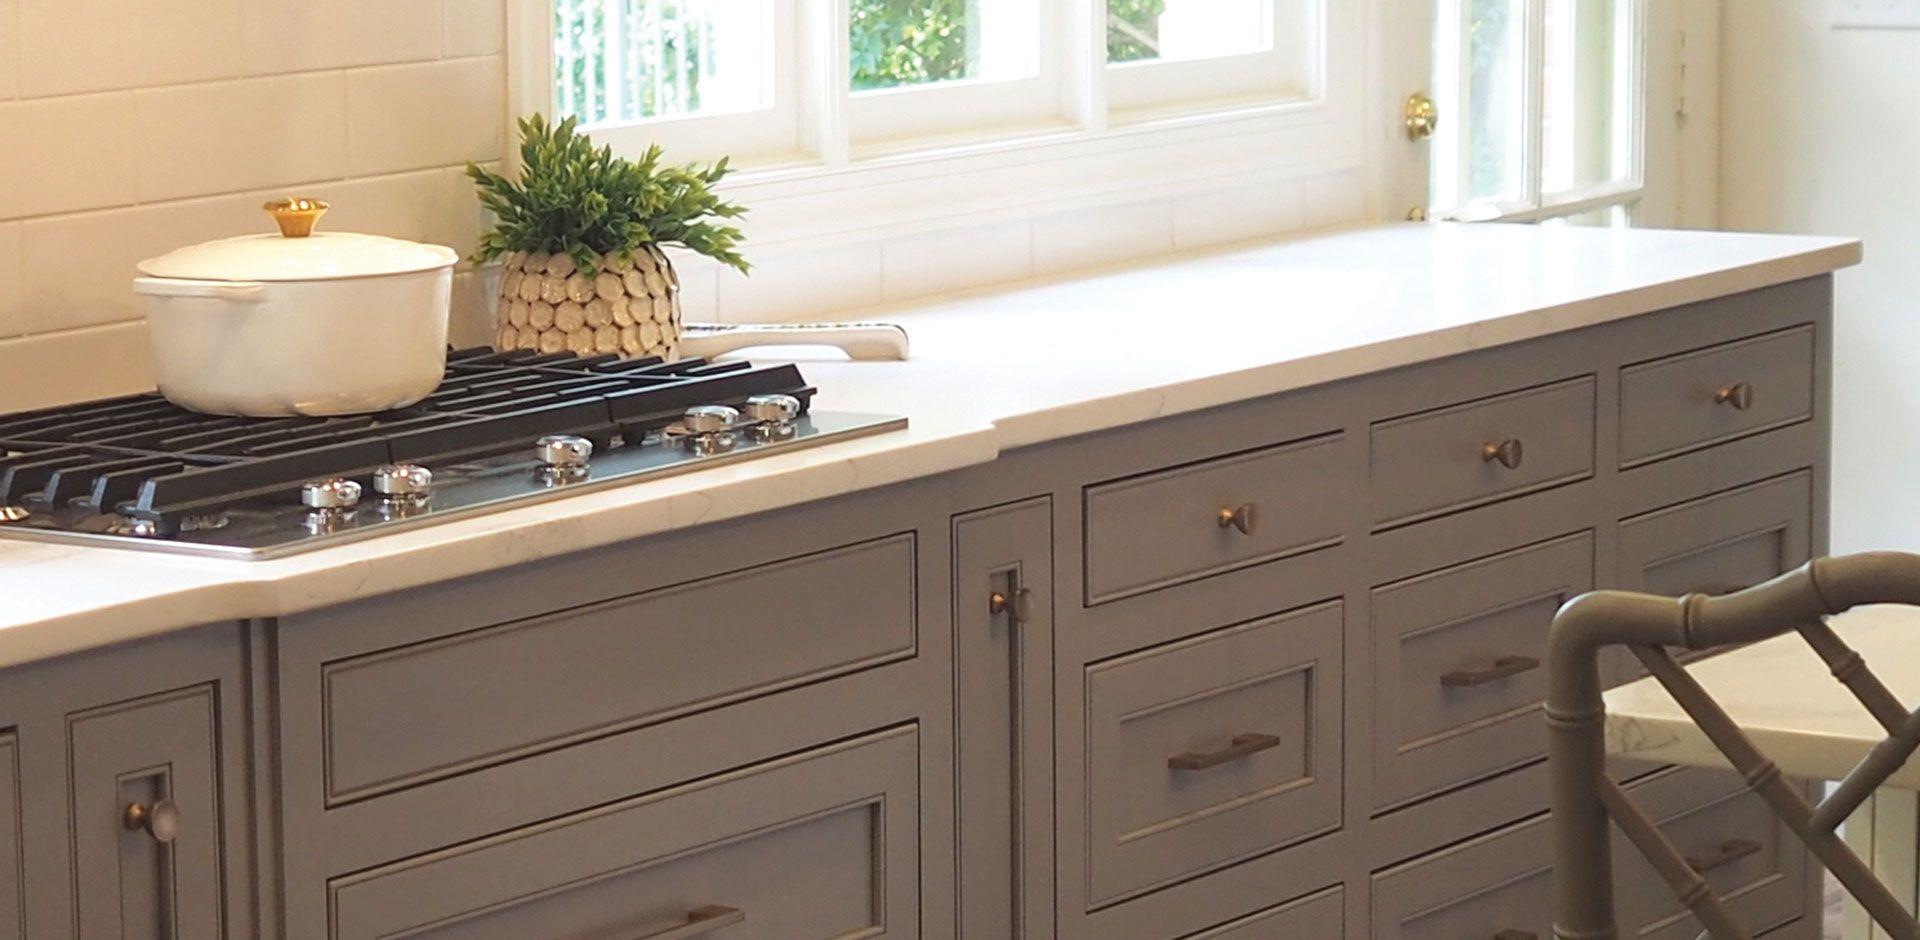 Best Calacatta Verona Quartz Countertop Transitional Kitchen 400 x 300